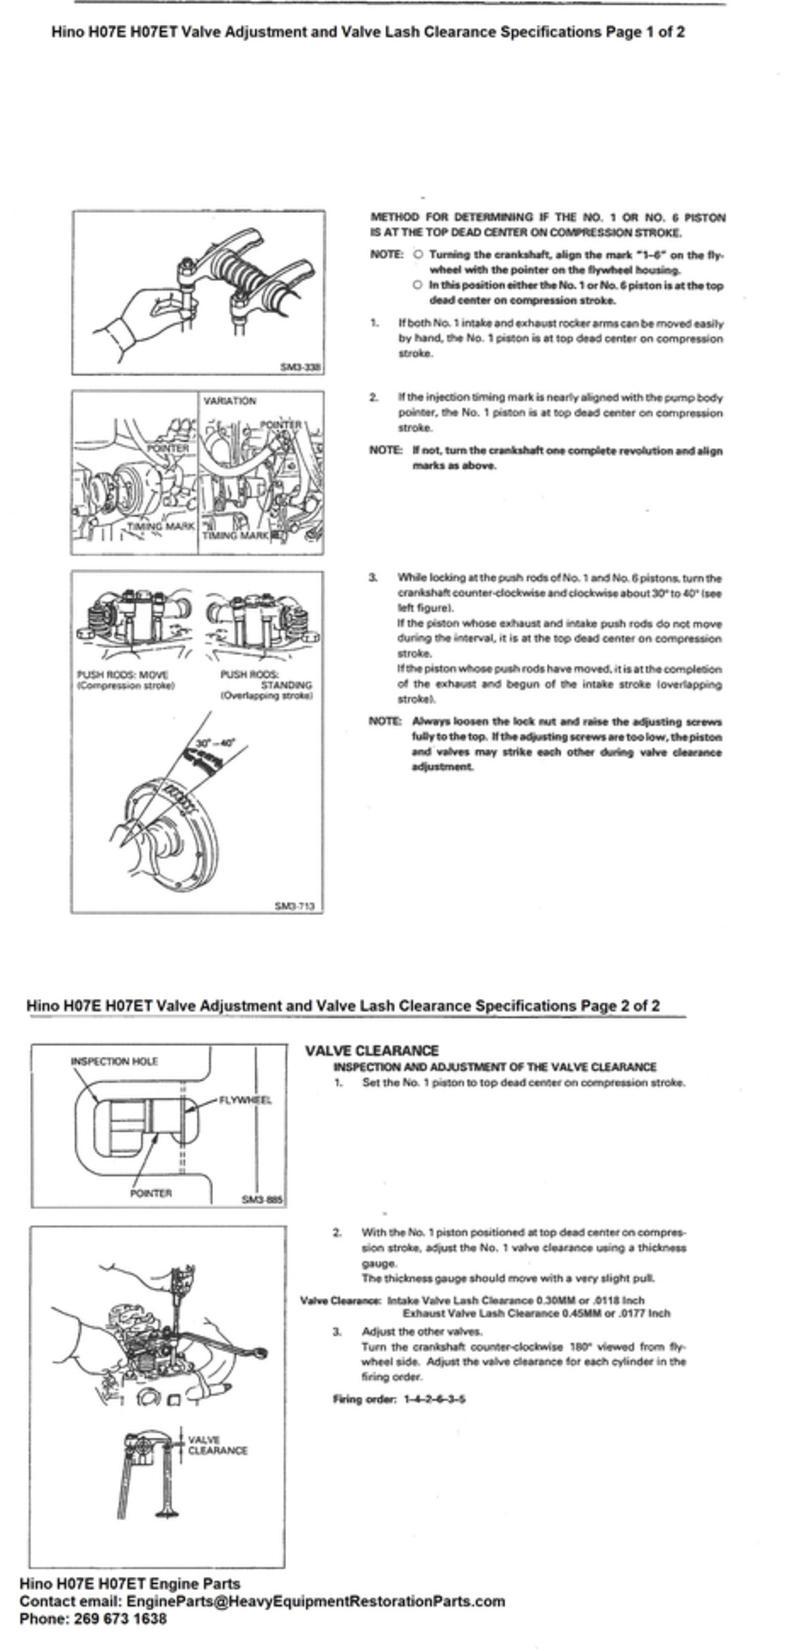 Hino Engine Parts - Hino H07E H07ET, Valve Adjustment